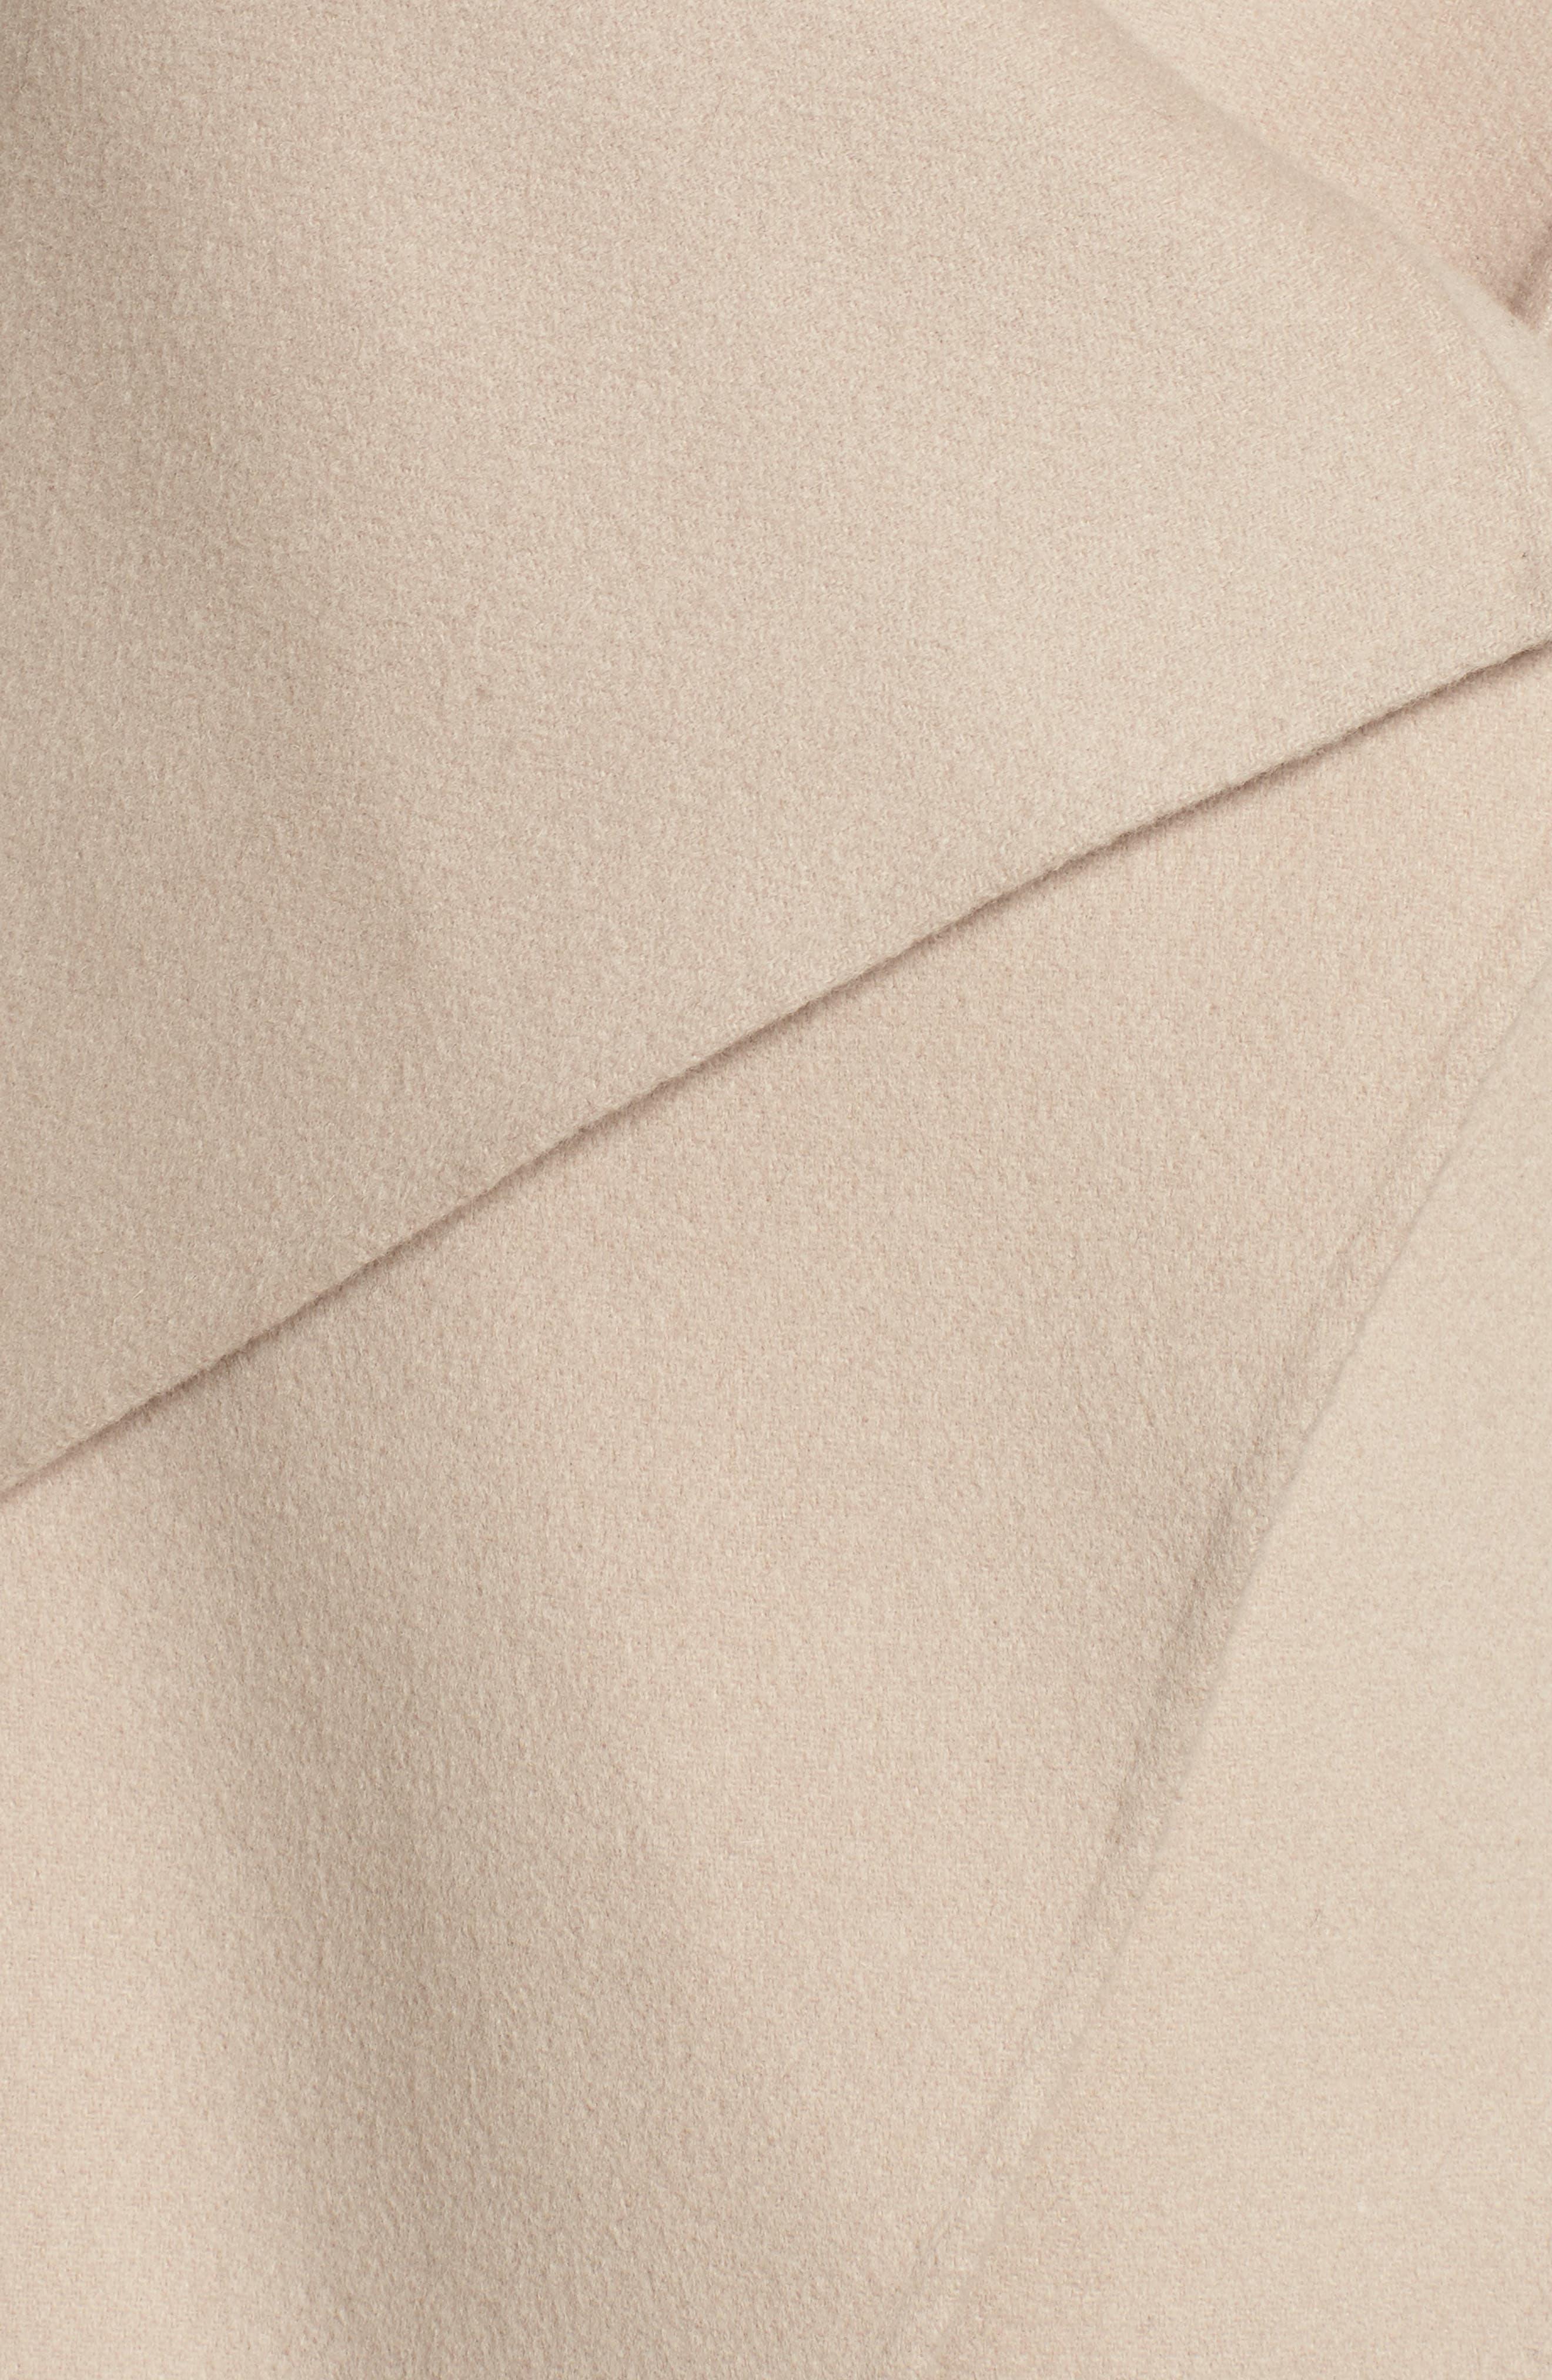 Vane Asymmetrical Leather Sleeve Coat,                             Alternate thumbnail 6, color,                             Sand